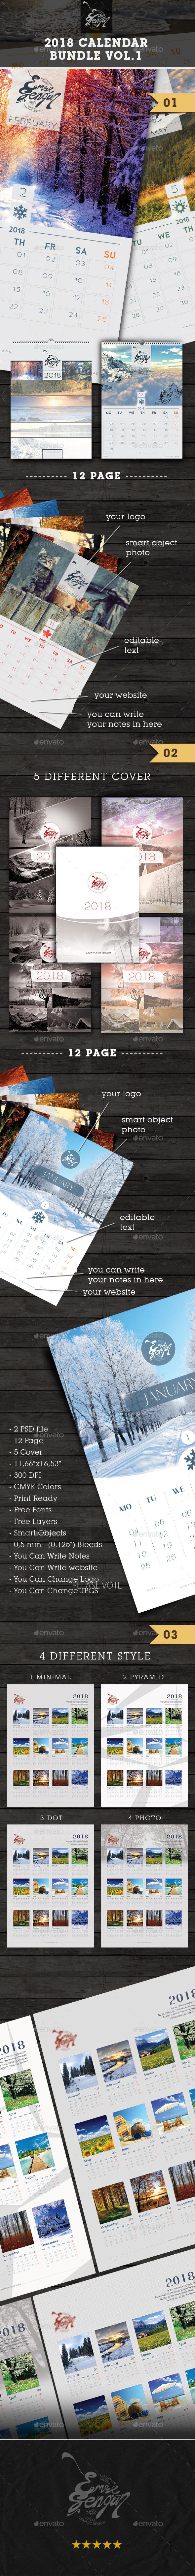 2018 Calendar Box Bundle Vol.1 - Calendars Stationery